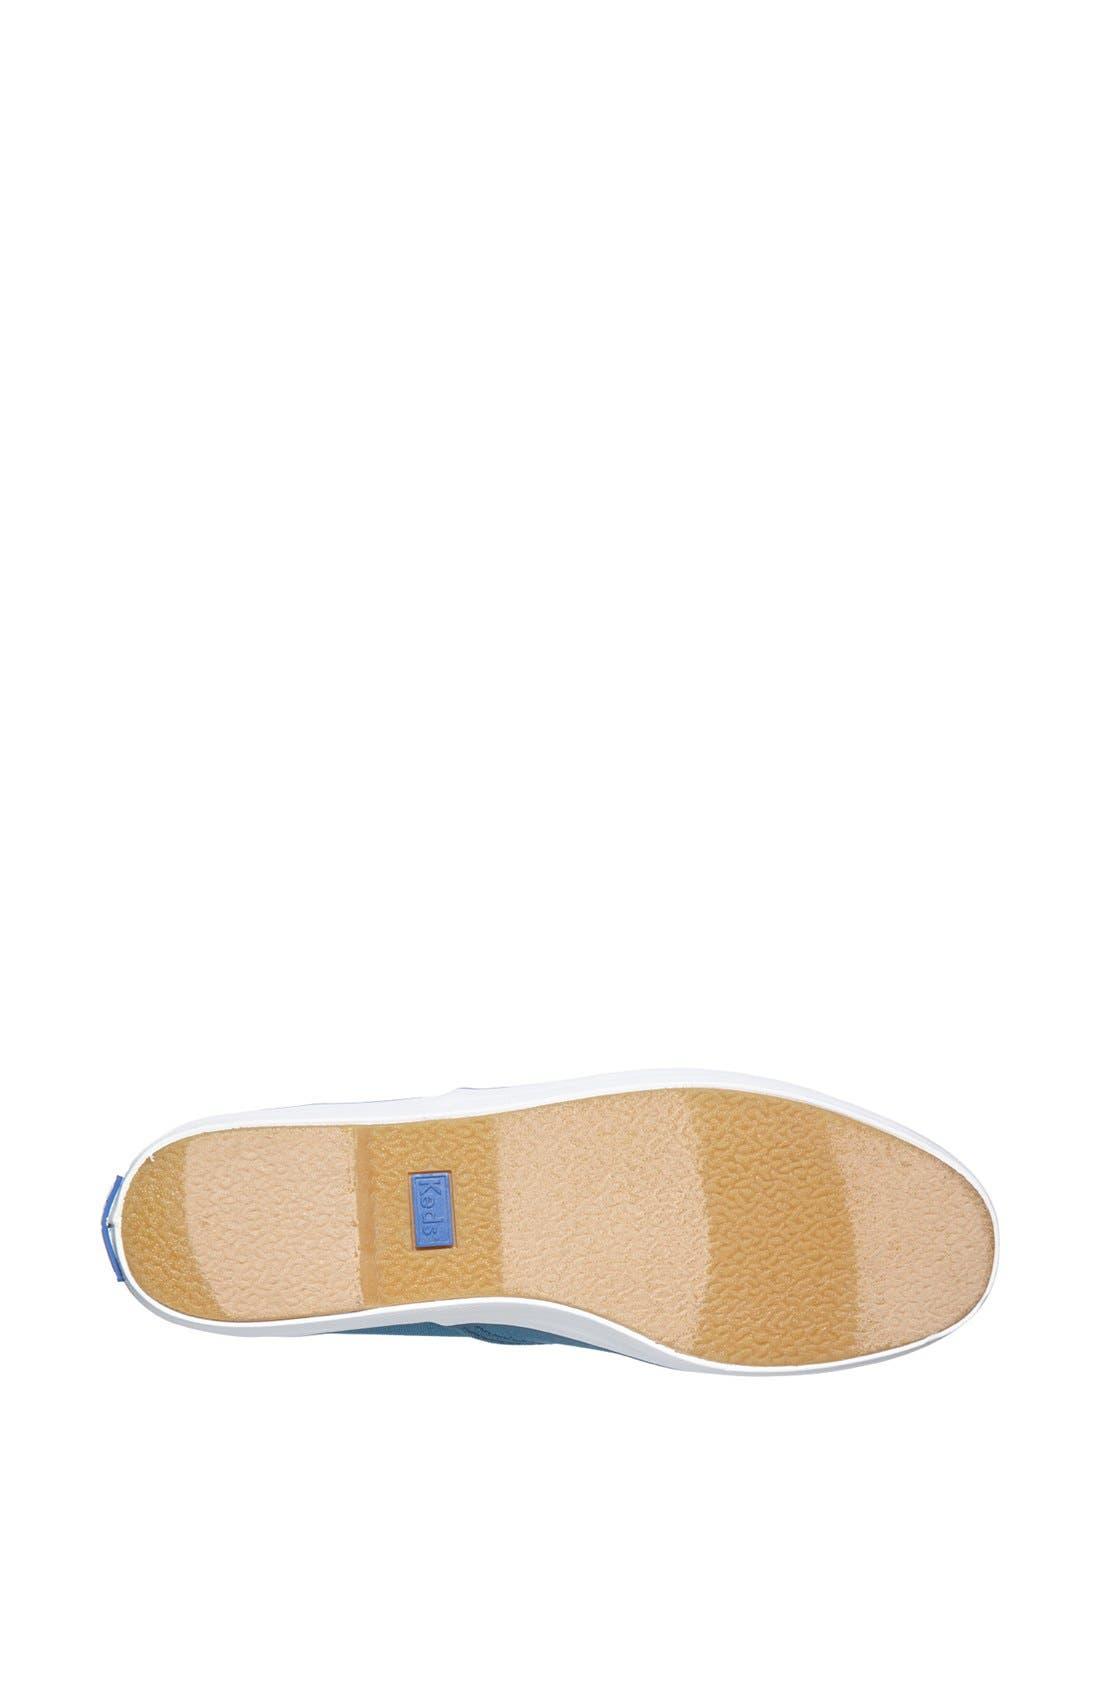 Alternate Image 4  - Keds® 'Champion' Canvas Sneaker (Women)